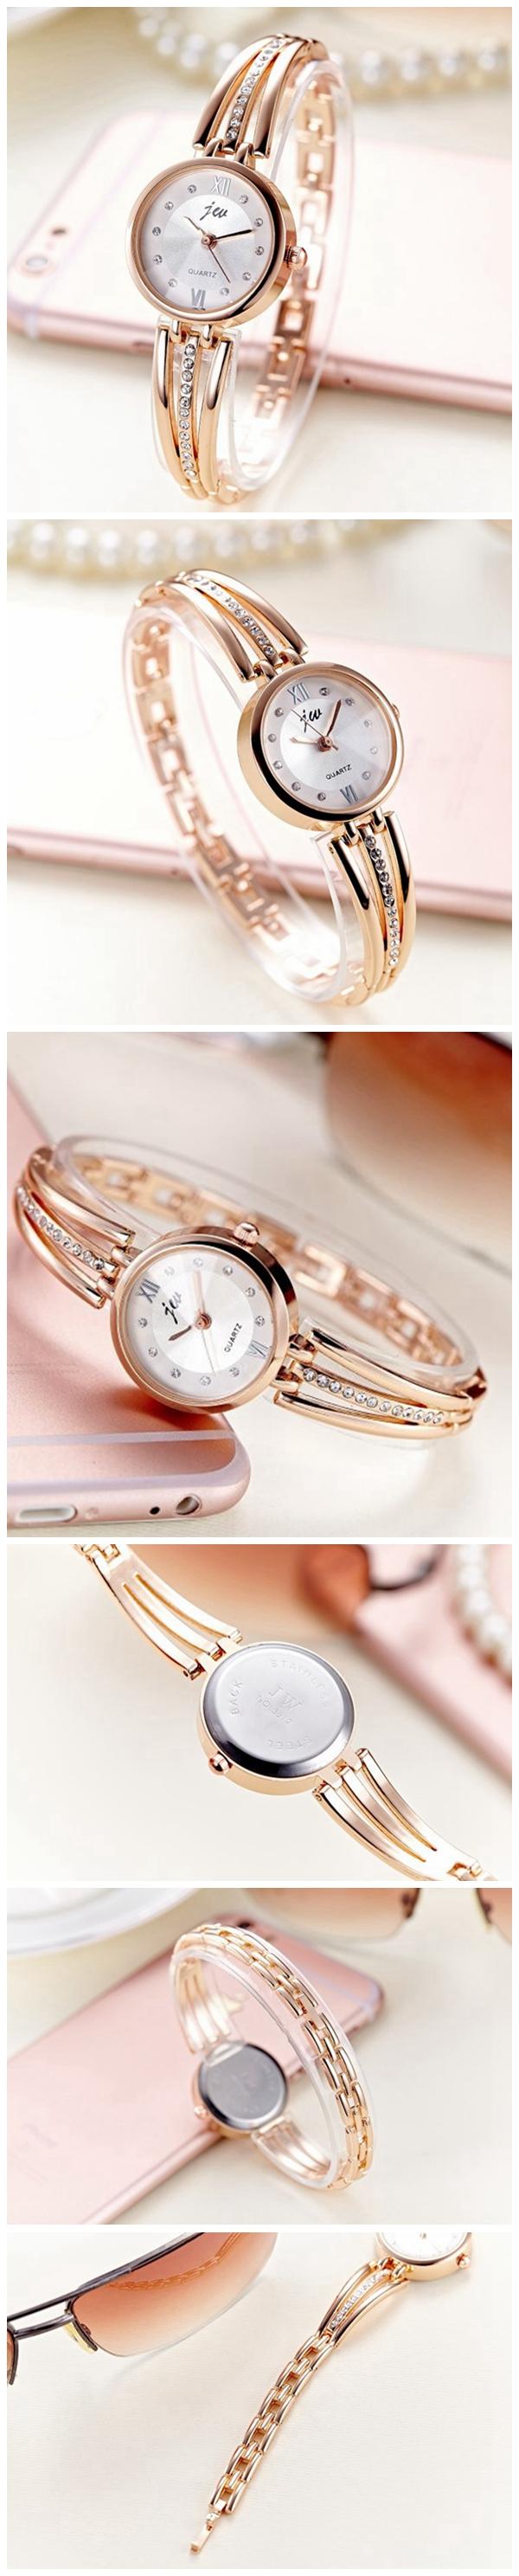 JW 3512 Fashion Round Dial Rhinestones Alloy Lady Bracelet Bangle Women Dress Quartz Watch